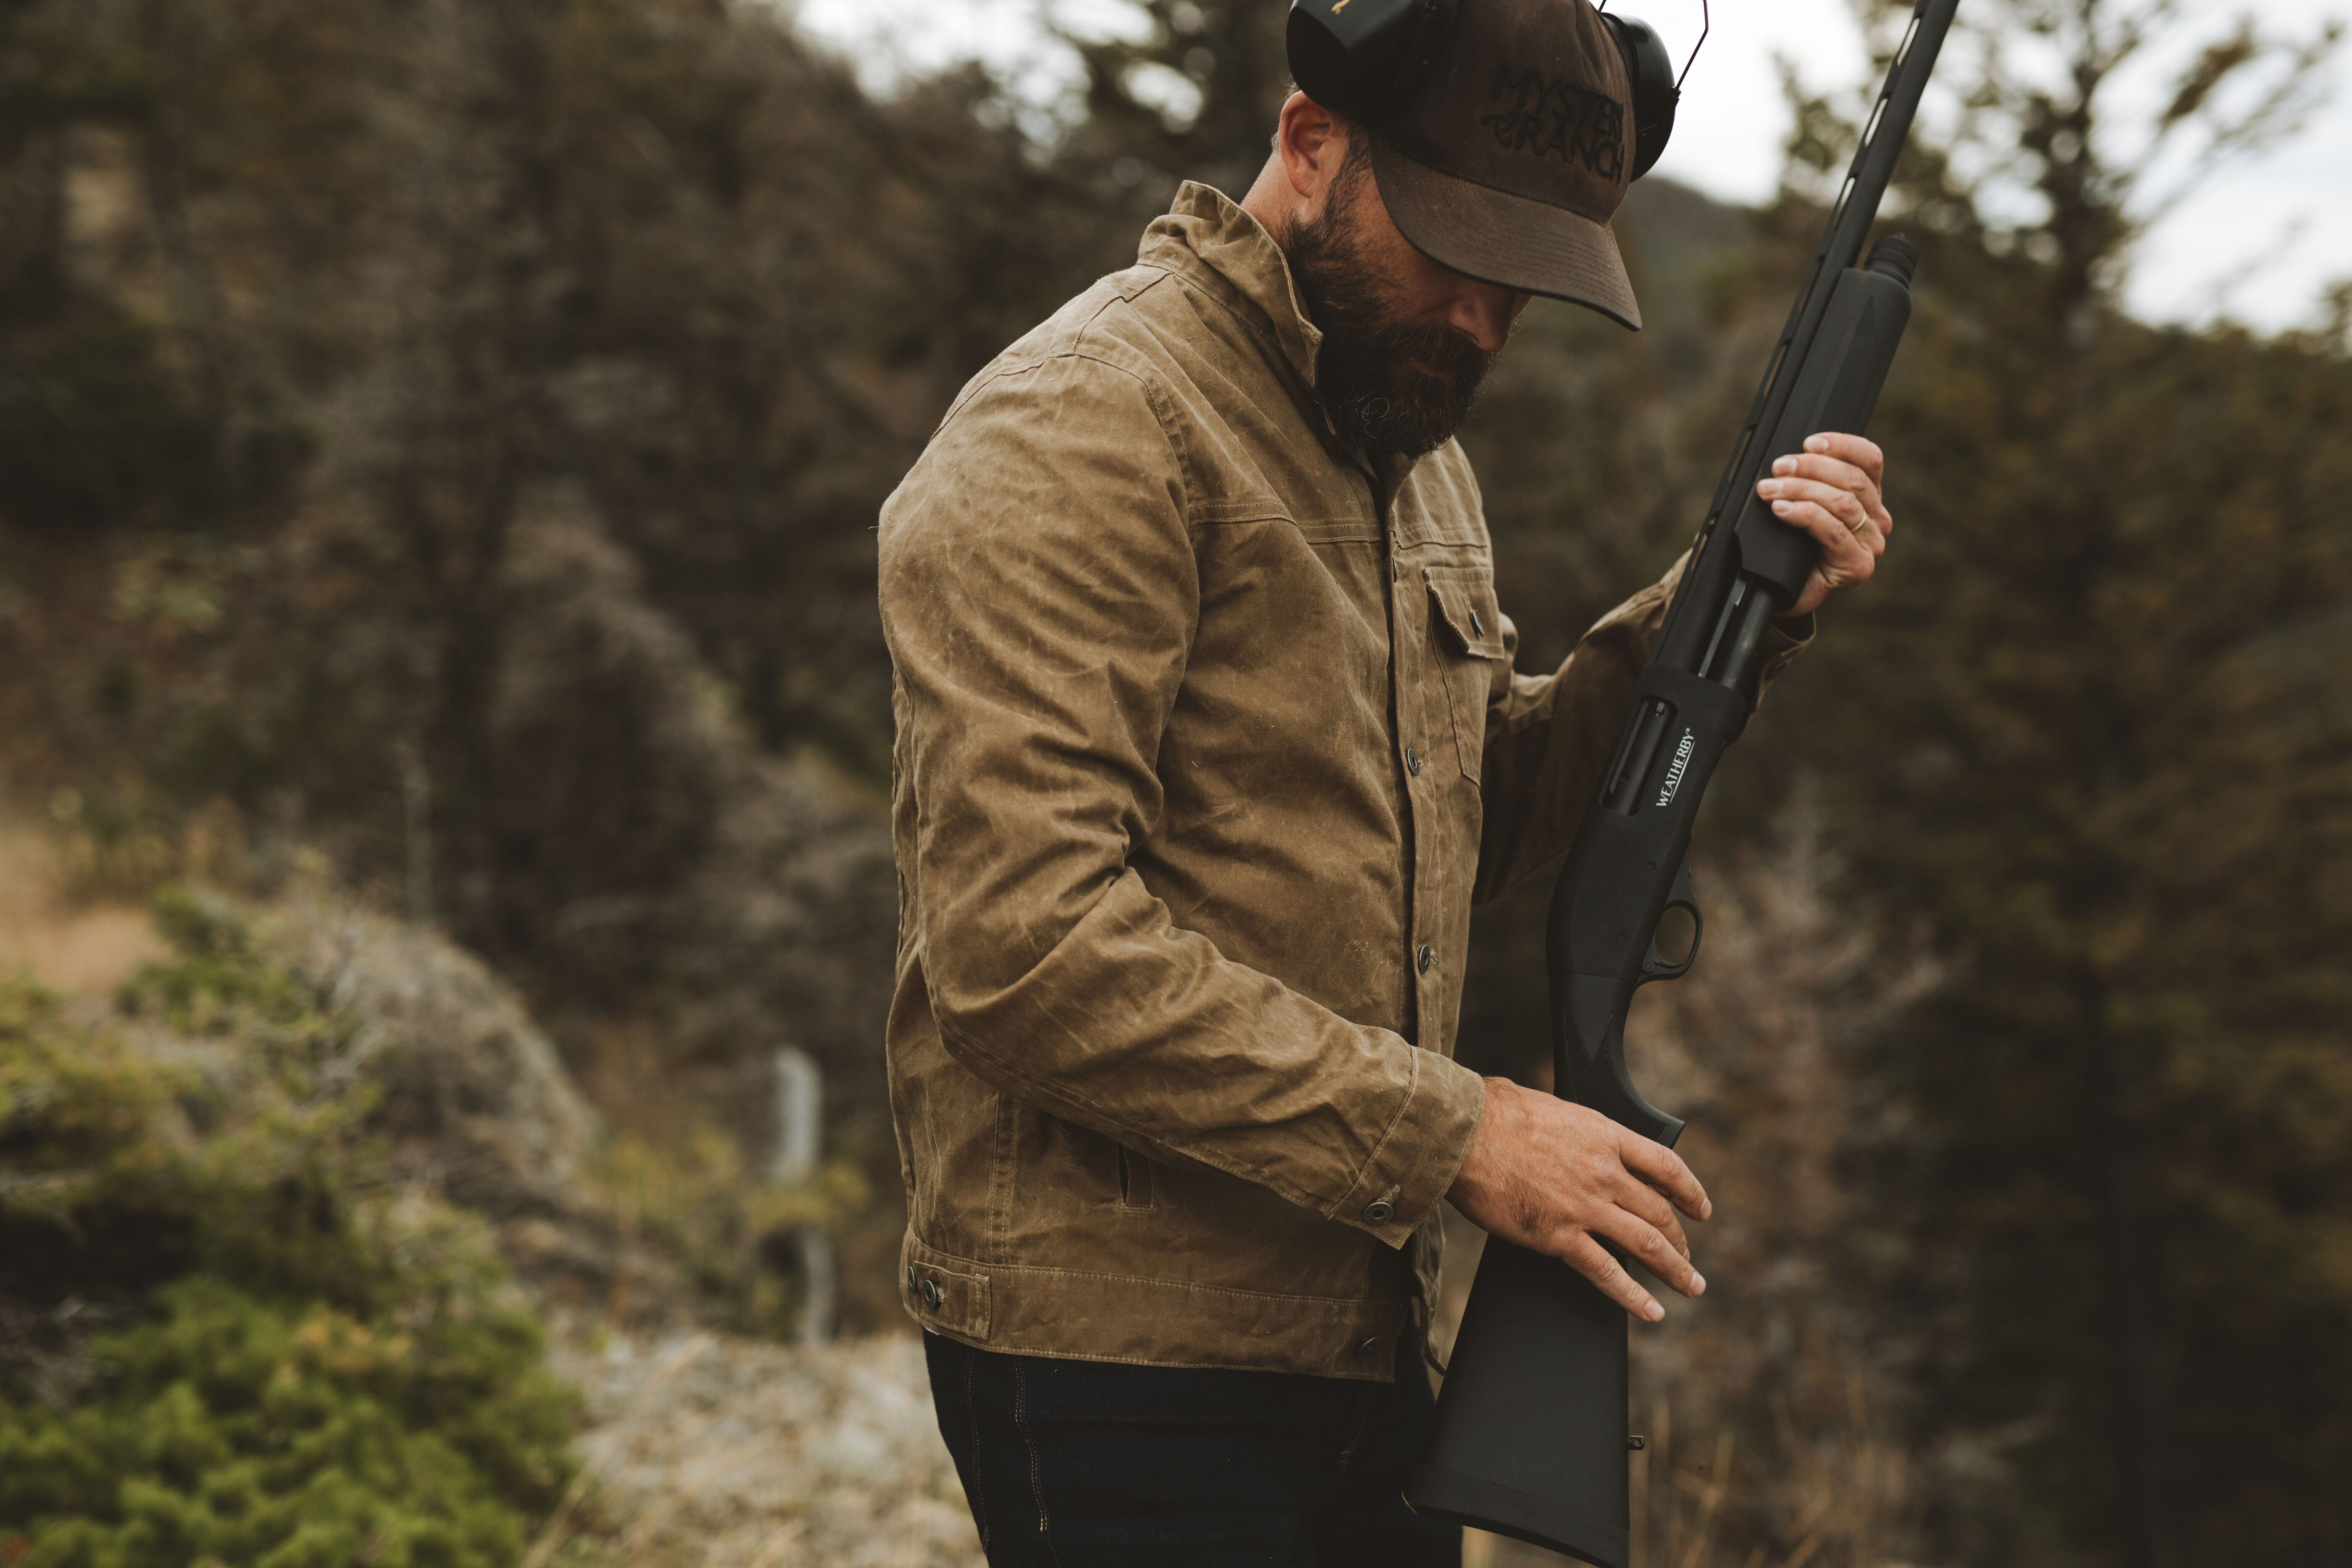 Ben Nobel hunting